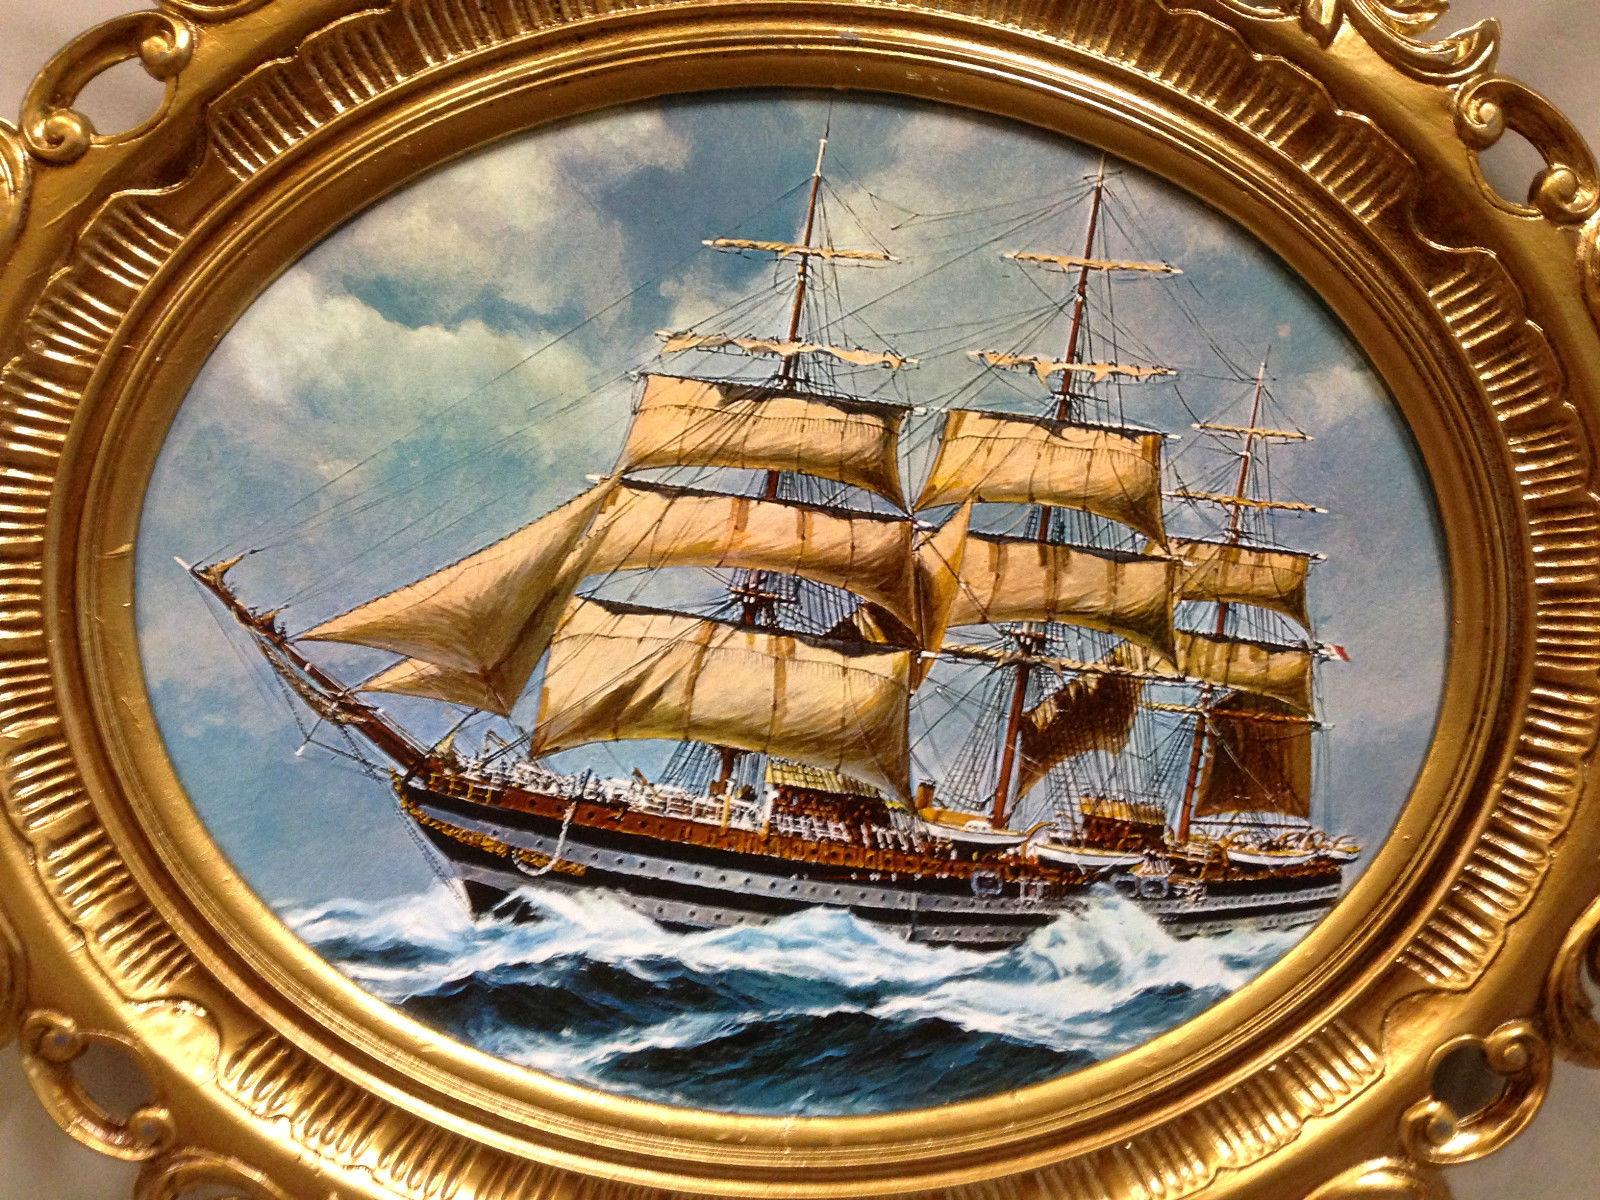 Segelschiffe auf dem meer  Segelschiff Meer Maritime Gemälde Schiff Bild Bilderrahmen Wandbild ...